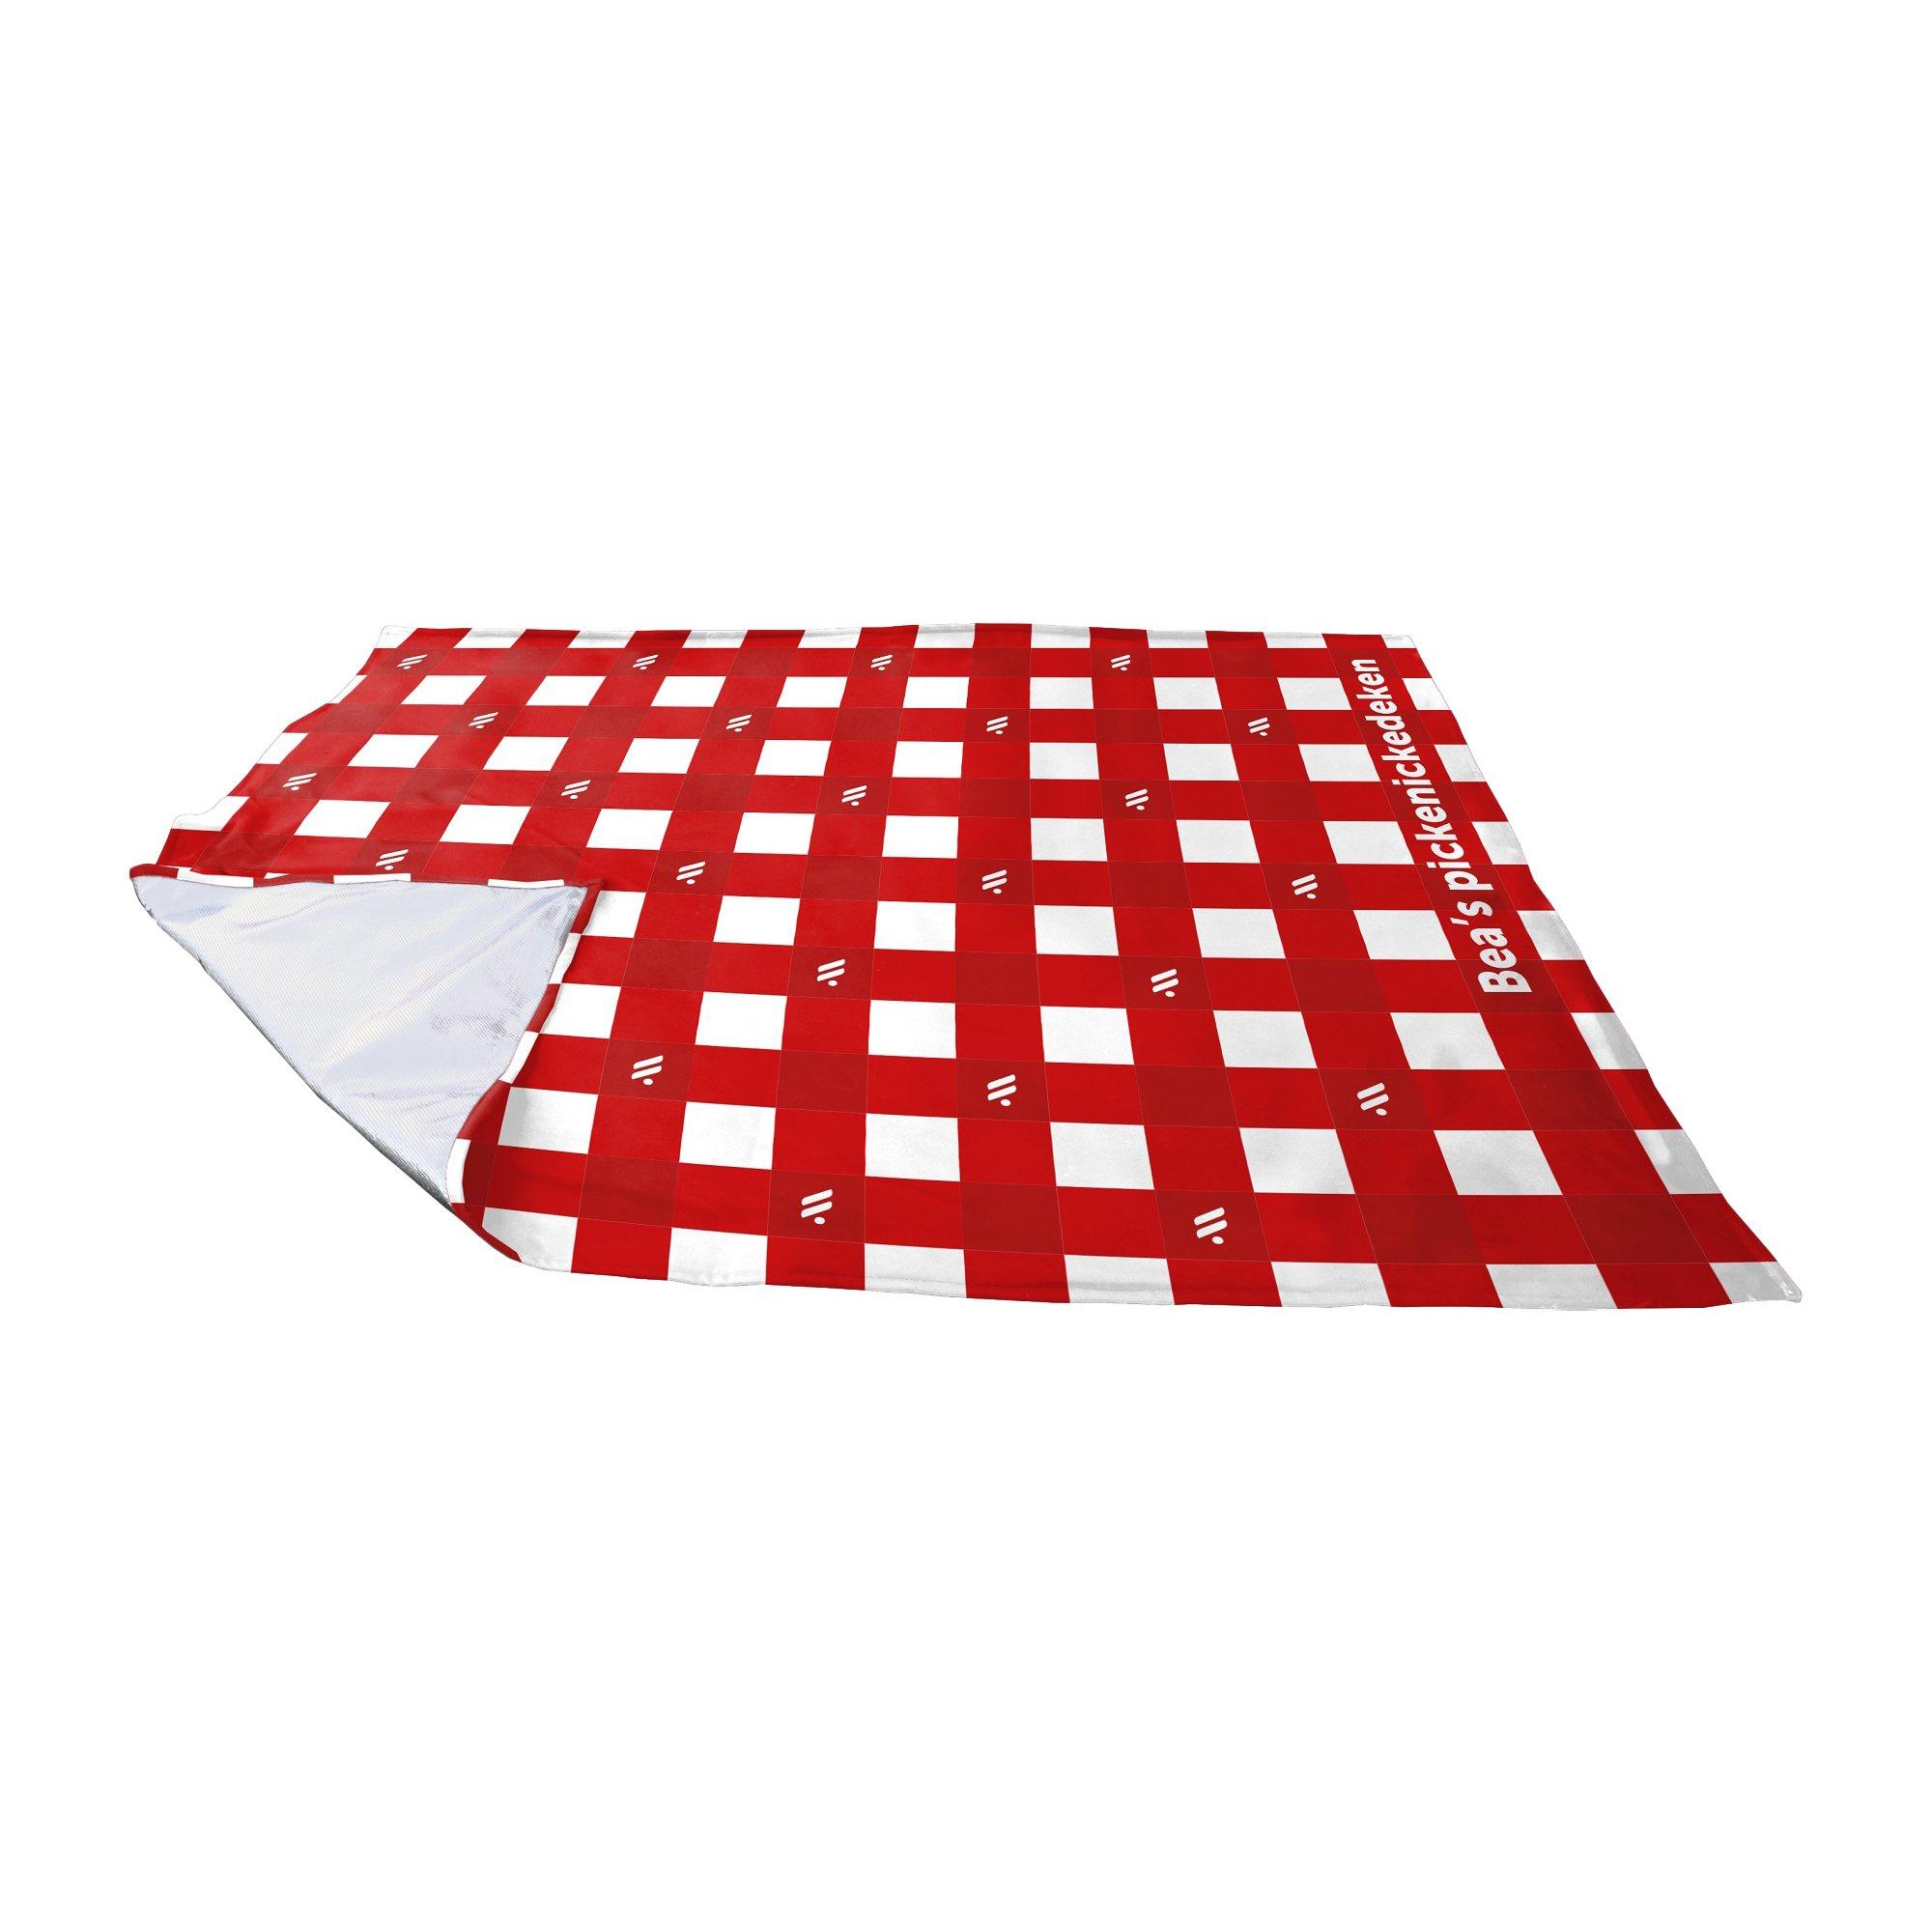 Leza medium picnic blanket, printed all-over